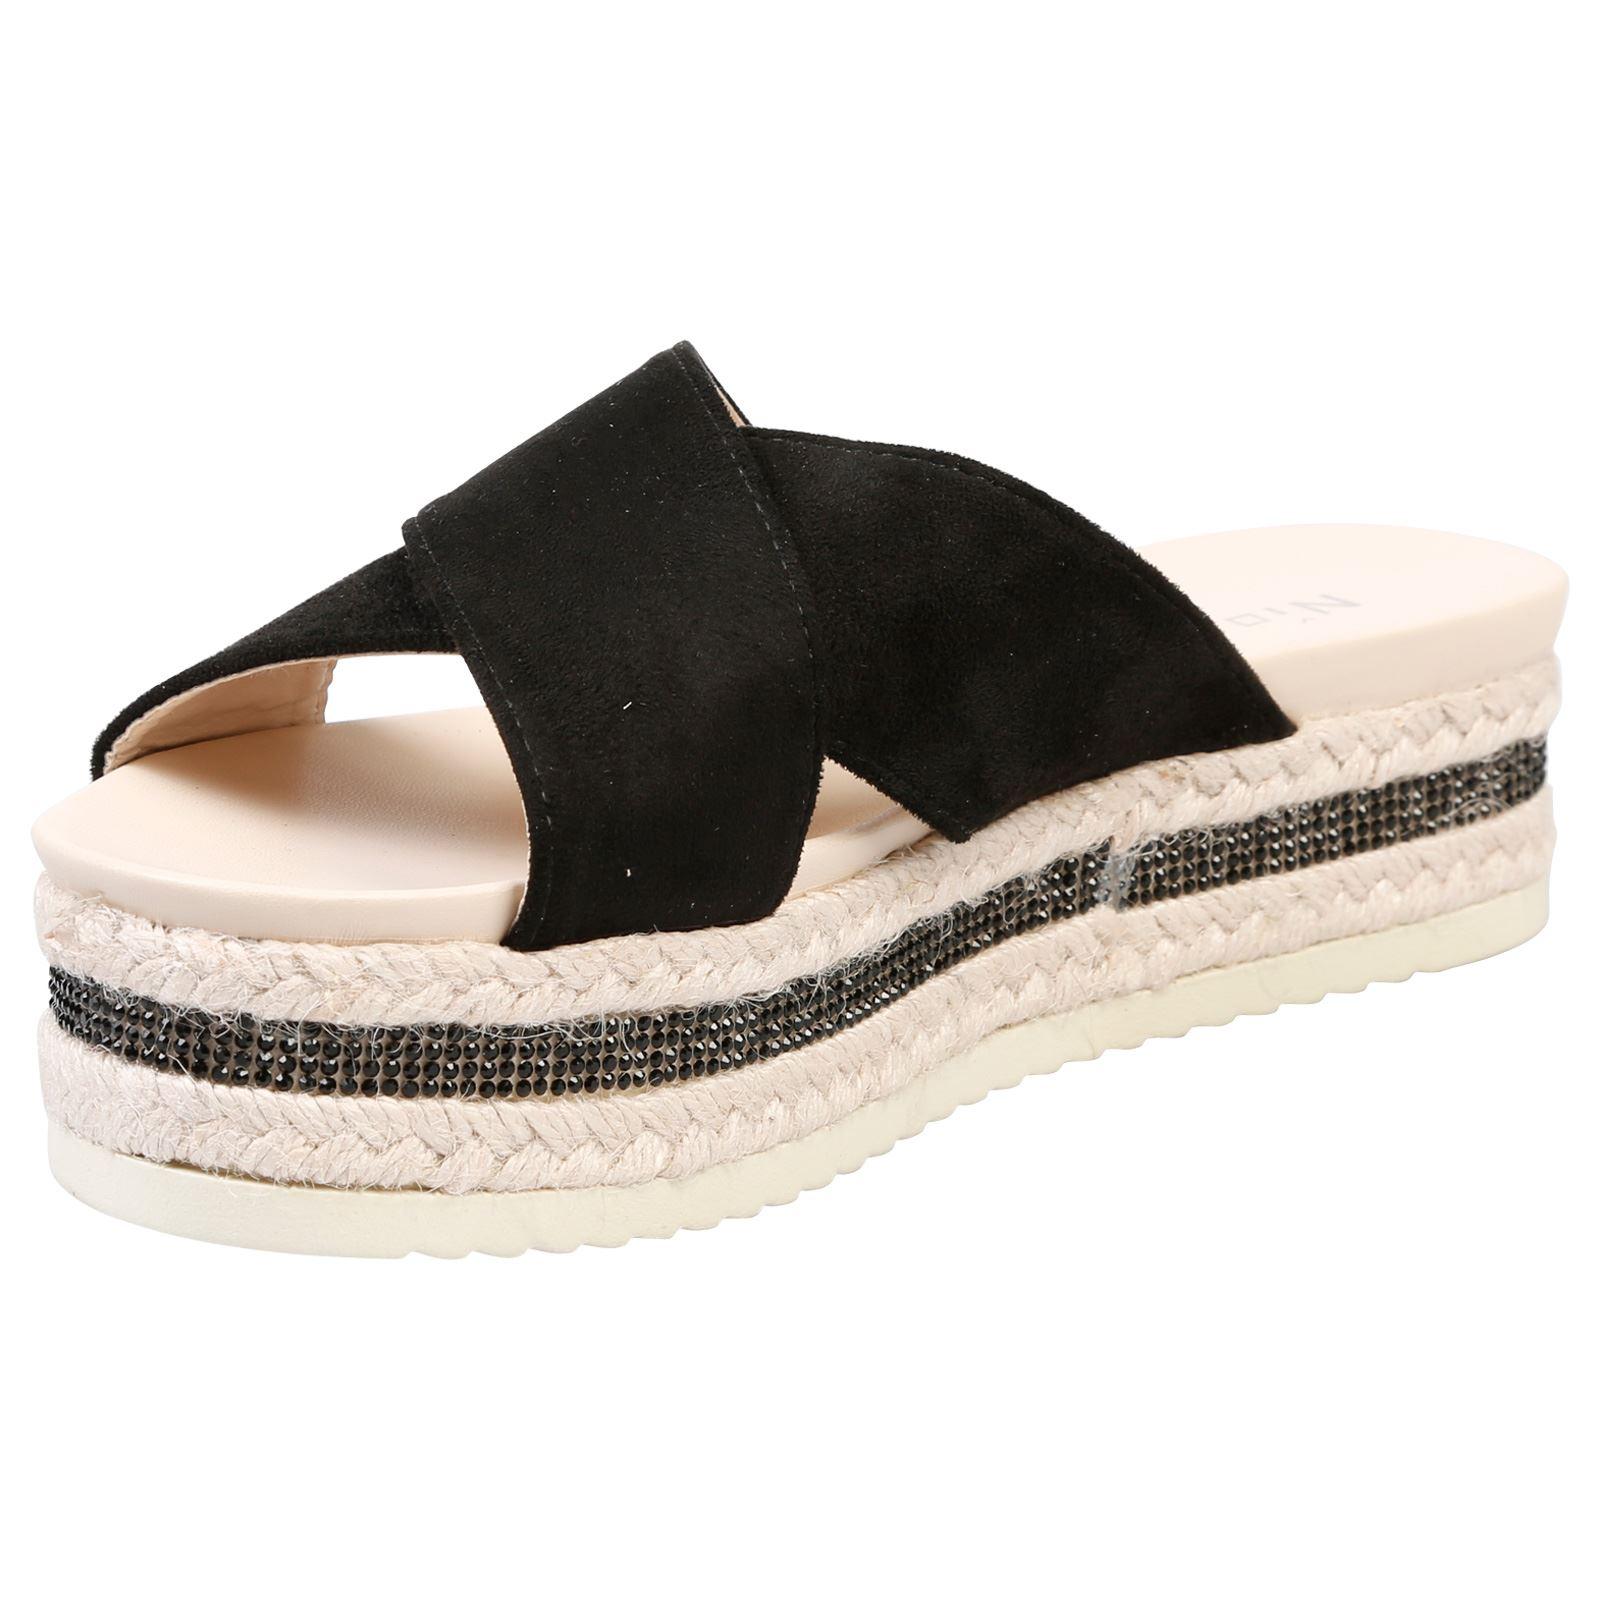 ba7e6f74b6e4 ... Primrose Womens Flatform Slip On On On Sandals Ladies Shoes Sliders  Peep Toe Diamante ca5bbe ...